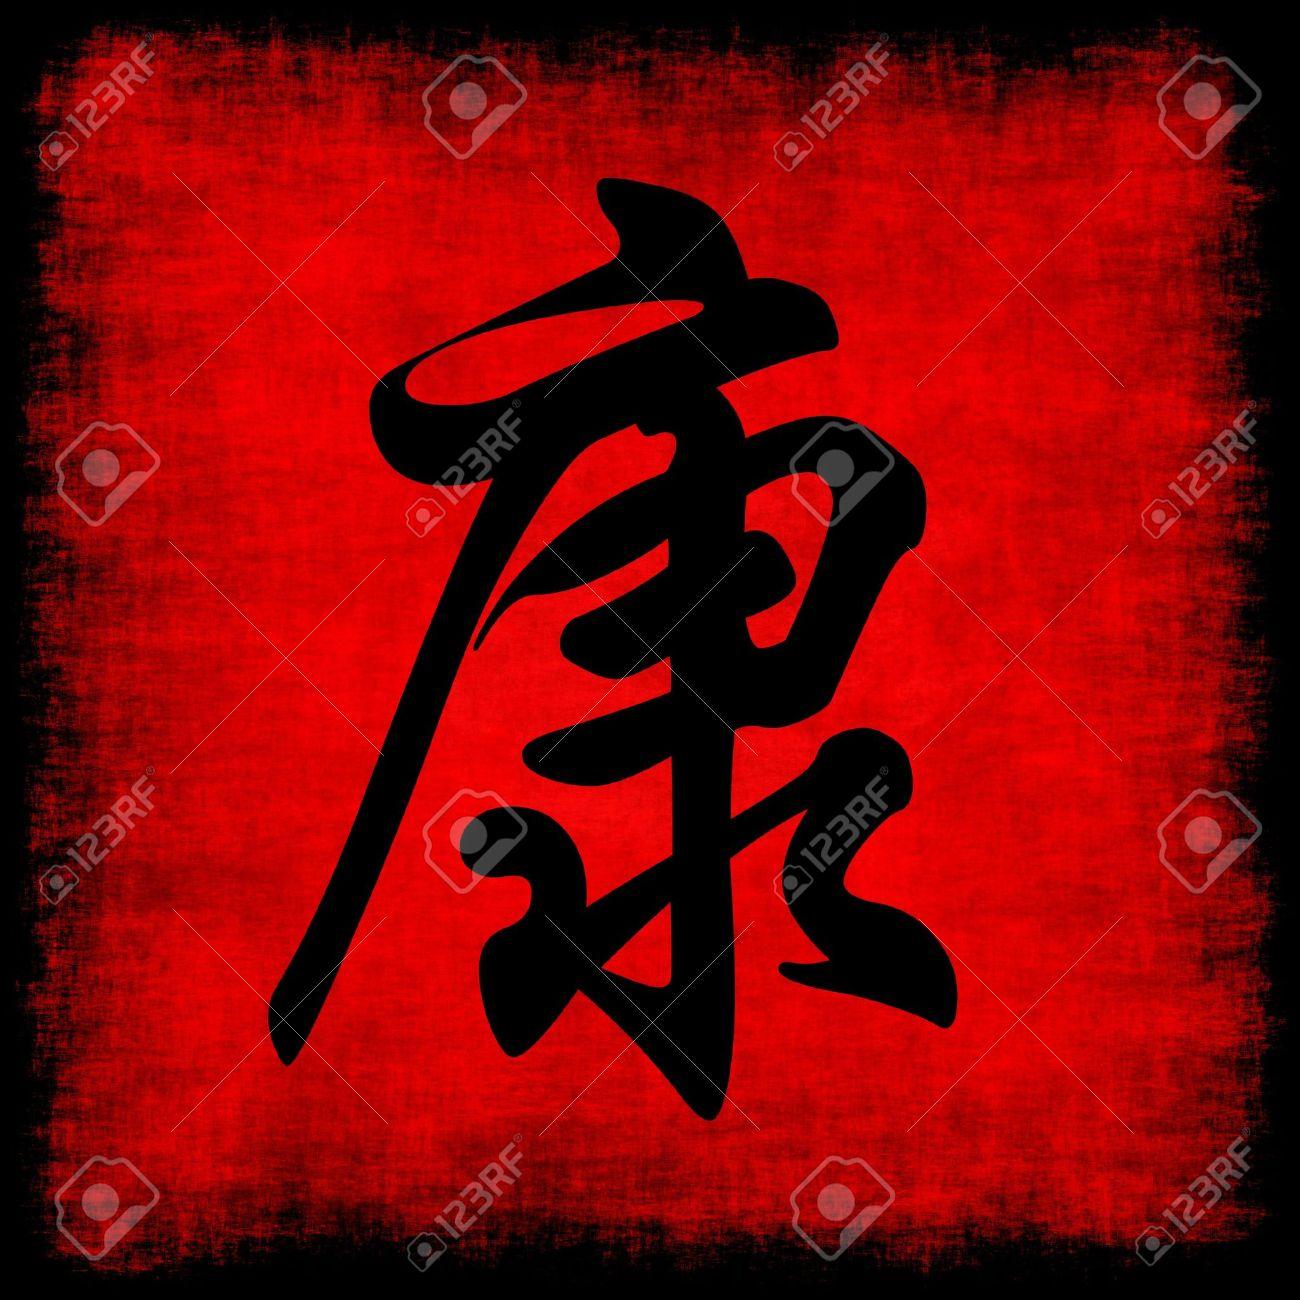 Health chinese calligraphy symbol grunge background set stock health chinese calligraphy symbol grunge background set stock photo 6188127 buycottarizona Choice Image